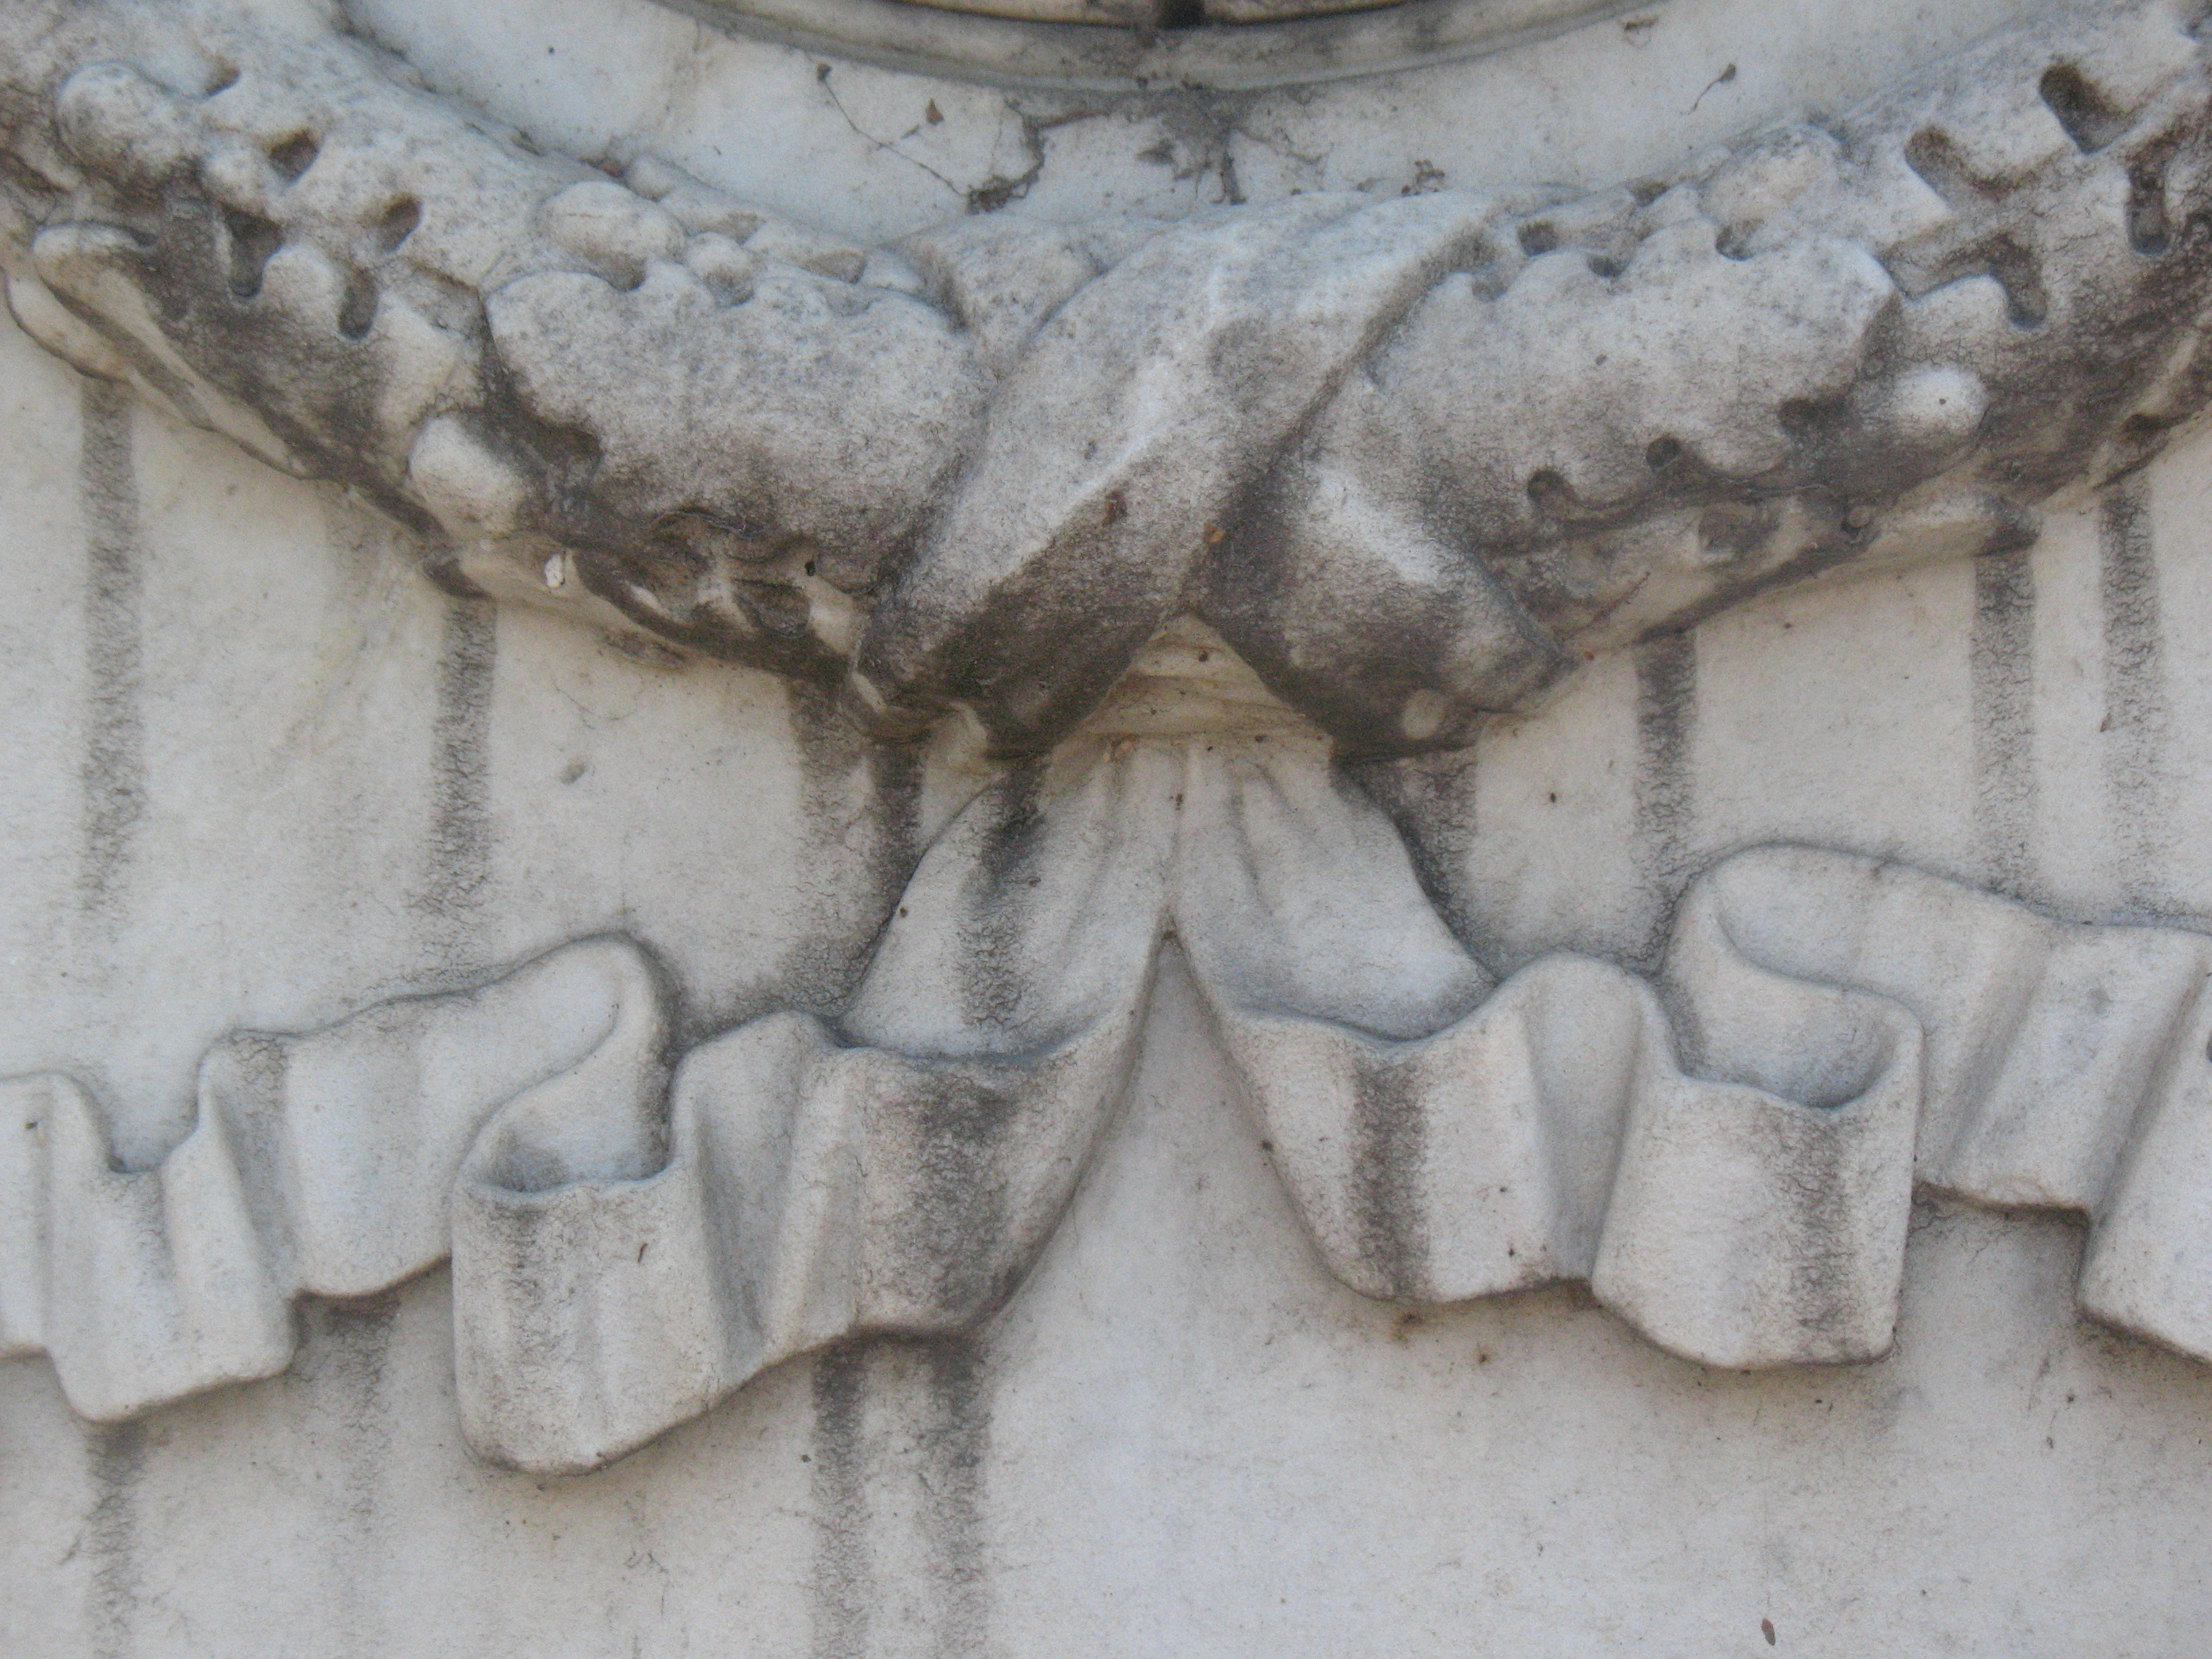 Грязевые натеки и грибы на белом мраморе